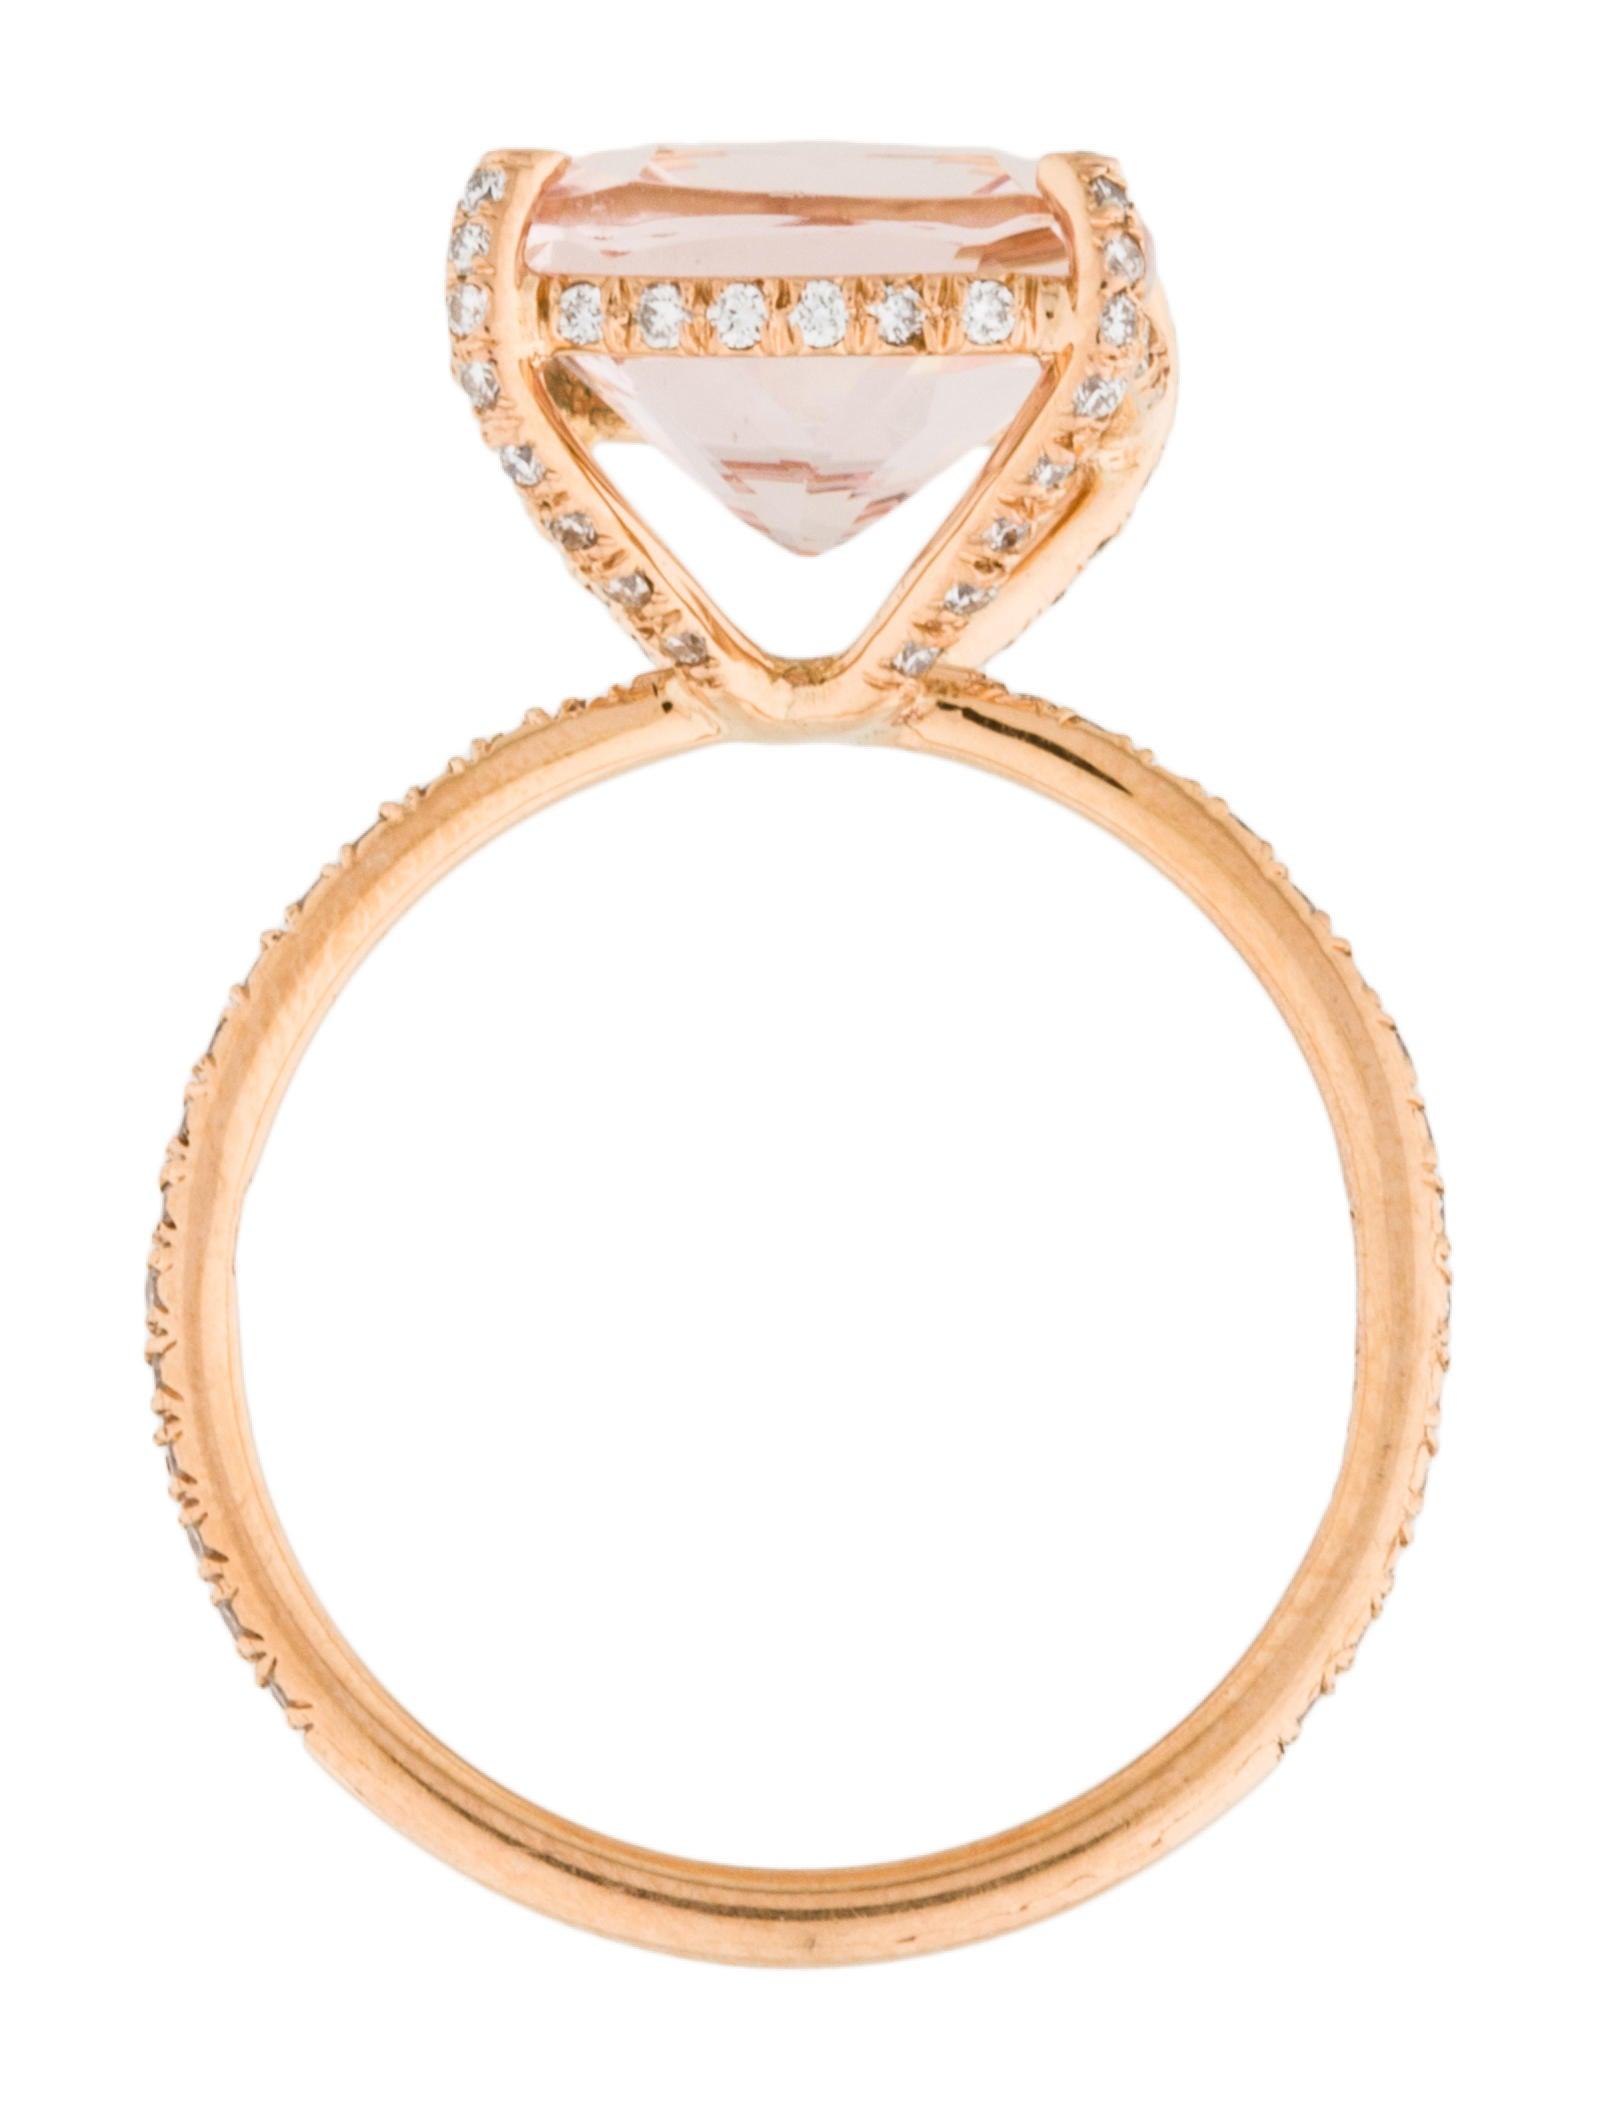 Vera Wang 18K Morganite & Diamond Candy Ring Rings VER